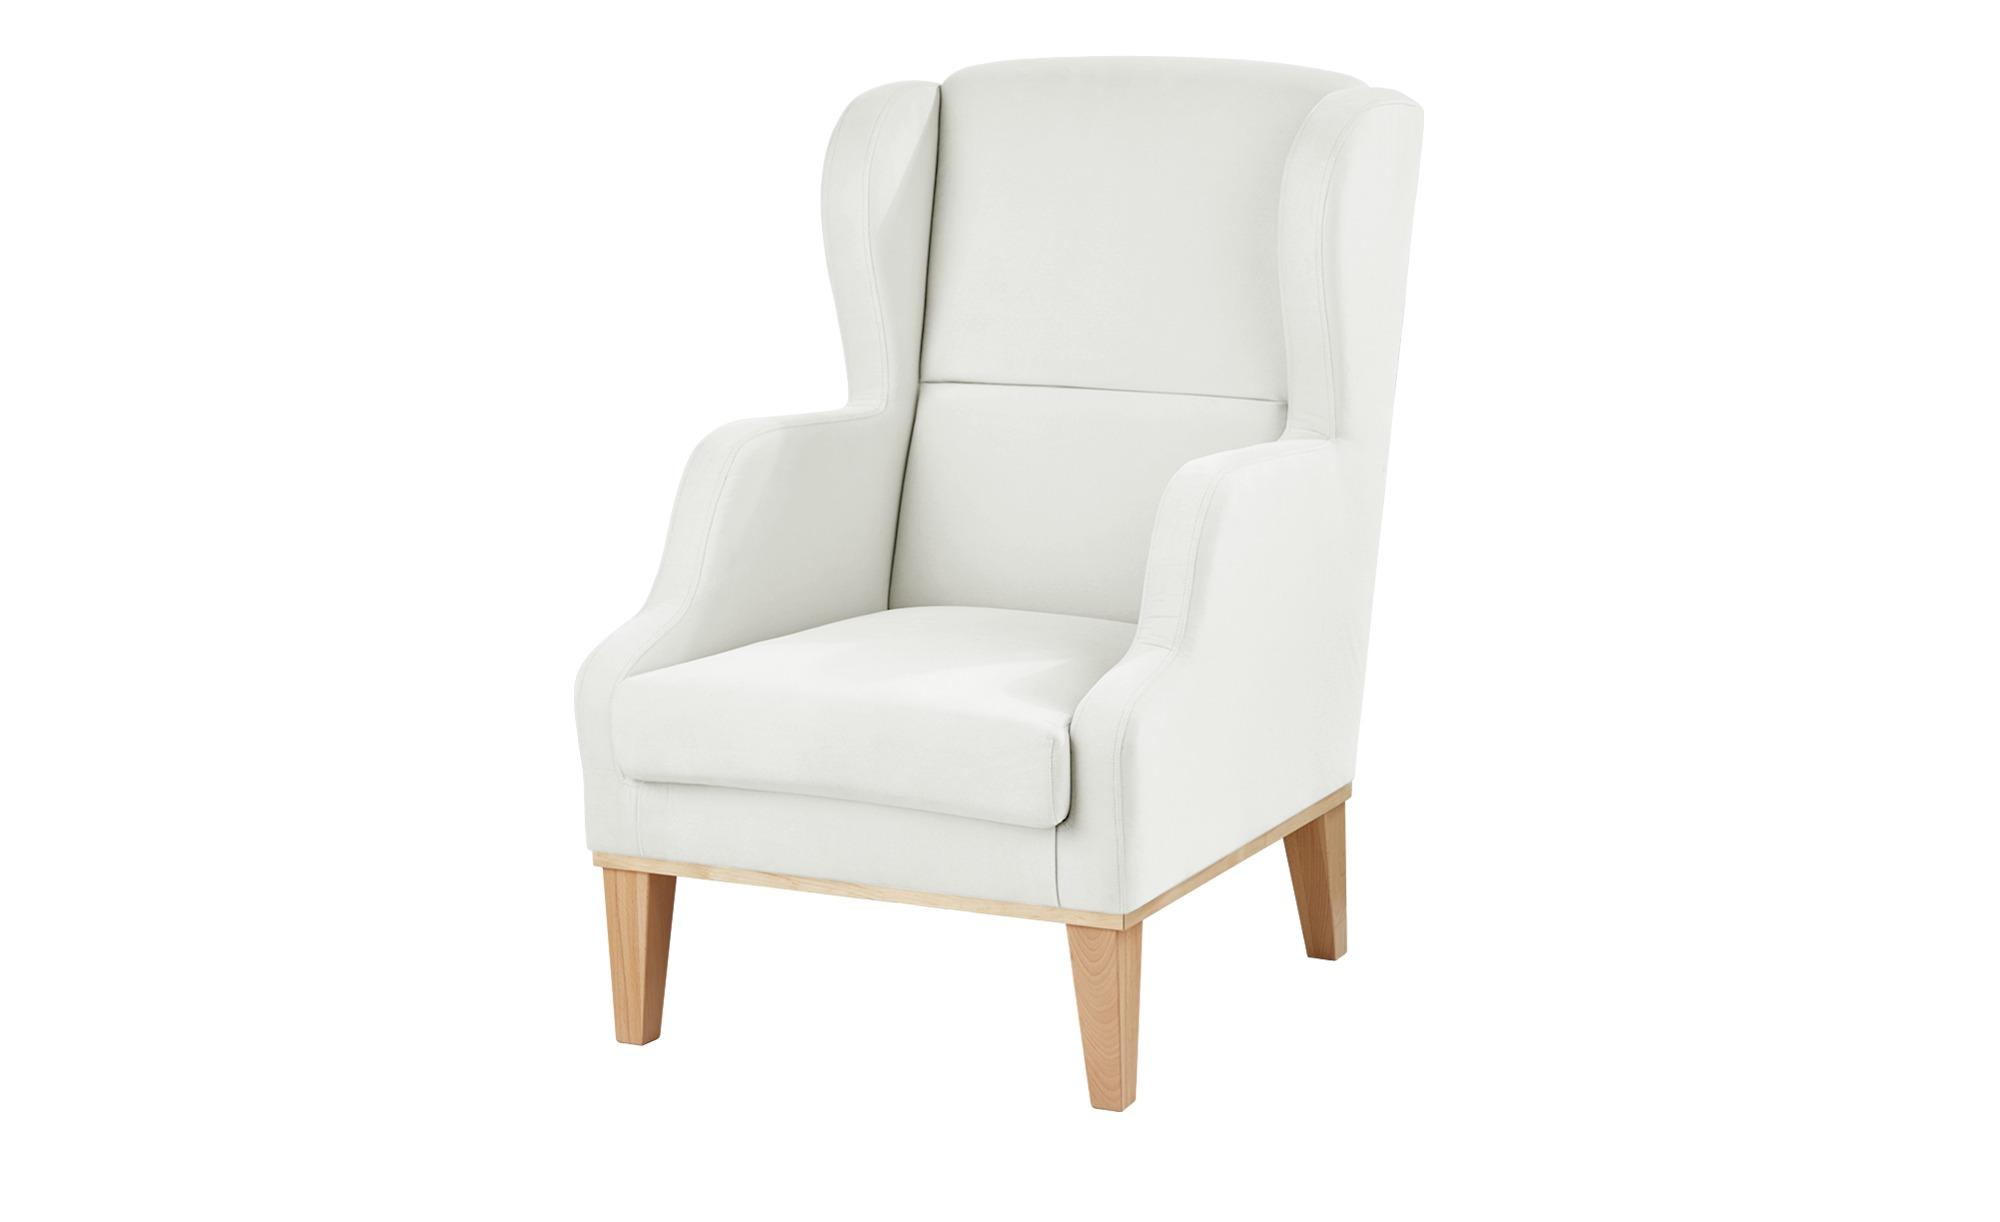 smart Sessel weiß - Stoff Marea ¦ weiß ¦ Maße (cm): B: 68 H: 102 T: 84 Polstermöbel > Sessel > Ohrensessel - Höffner